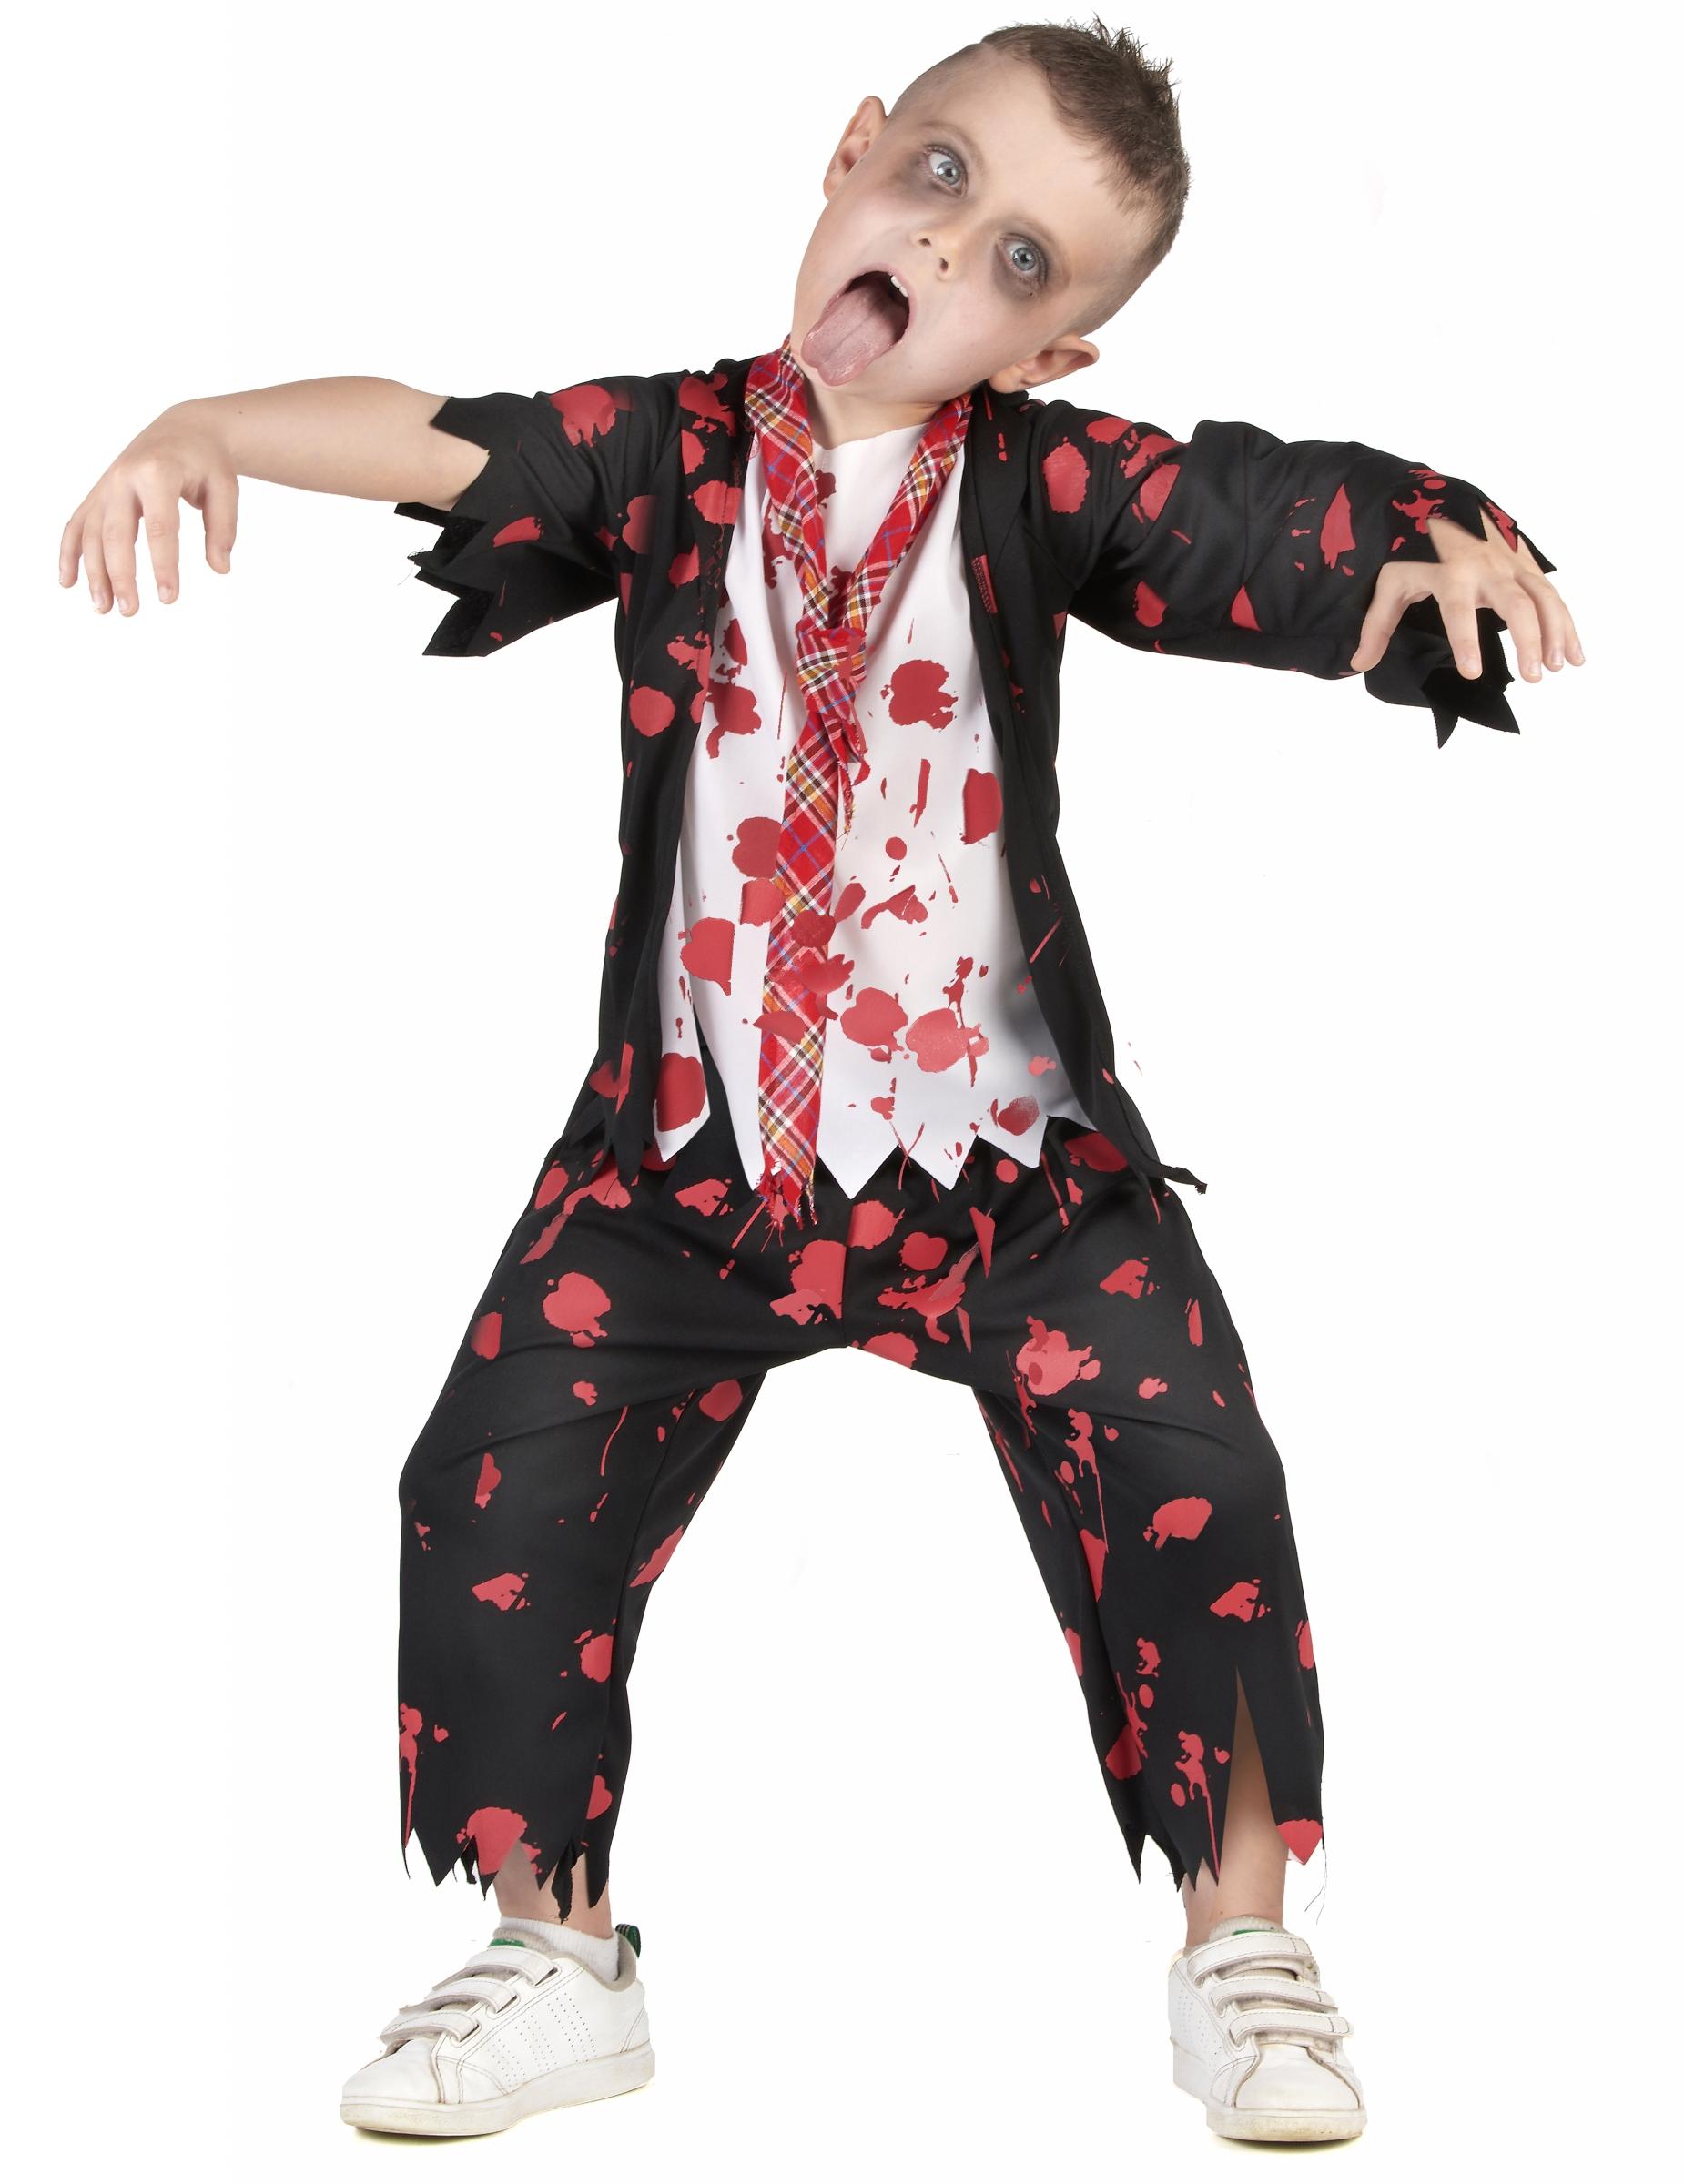 Halloween Kostume Jungs.Zombie Schuler Kostum Fur Jungen Halloween Kostum Schwarz Weiss Rot Gunstige Faschings Kostume Bei Karneval Megastore